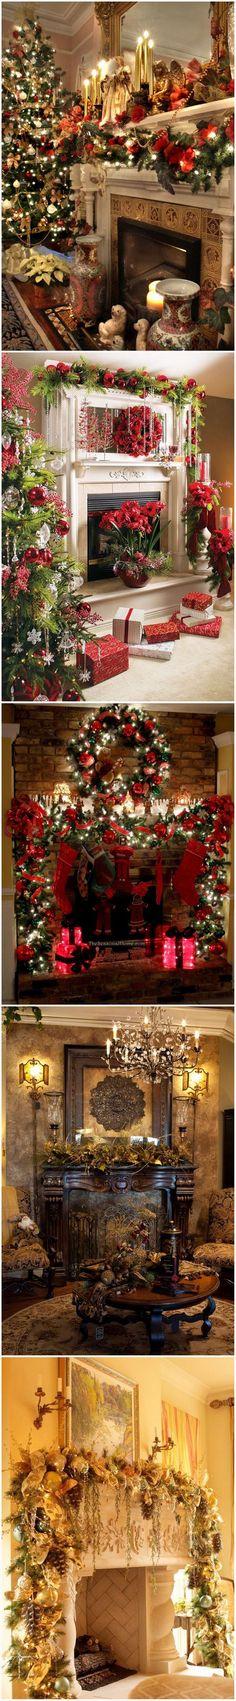 Christmas Mantle Decorating Ideas #styleestate